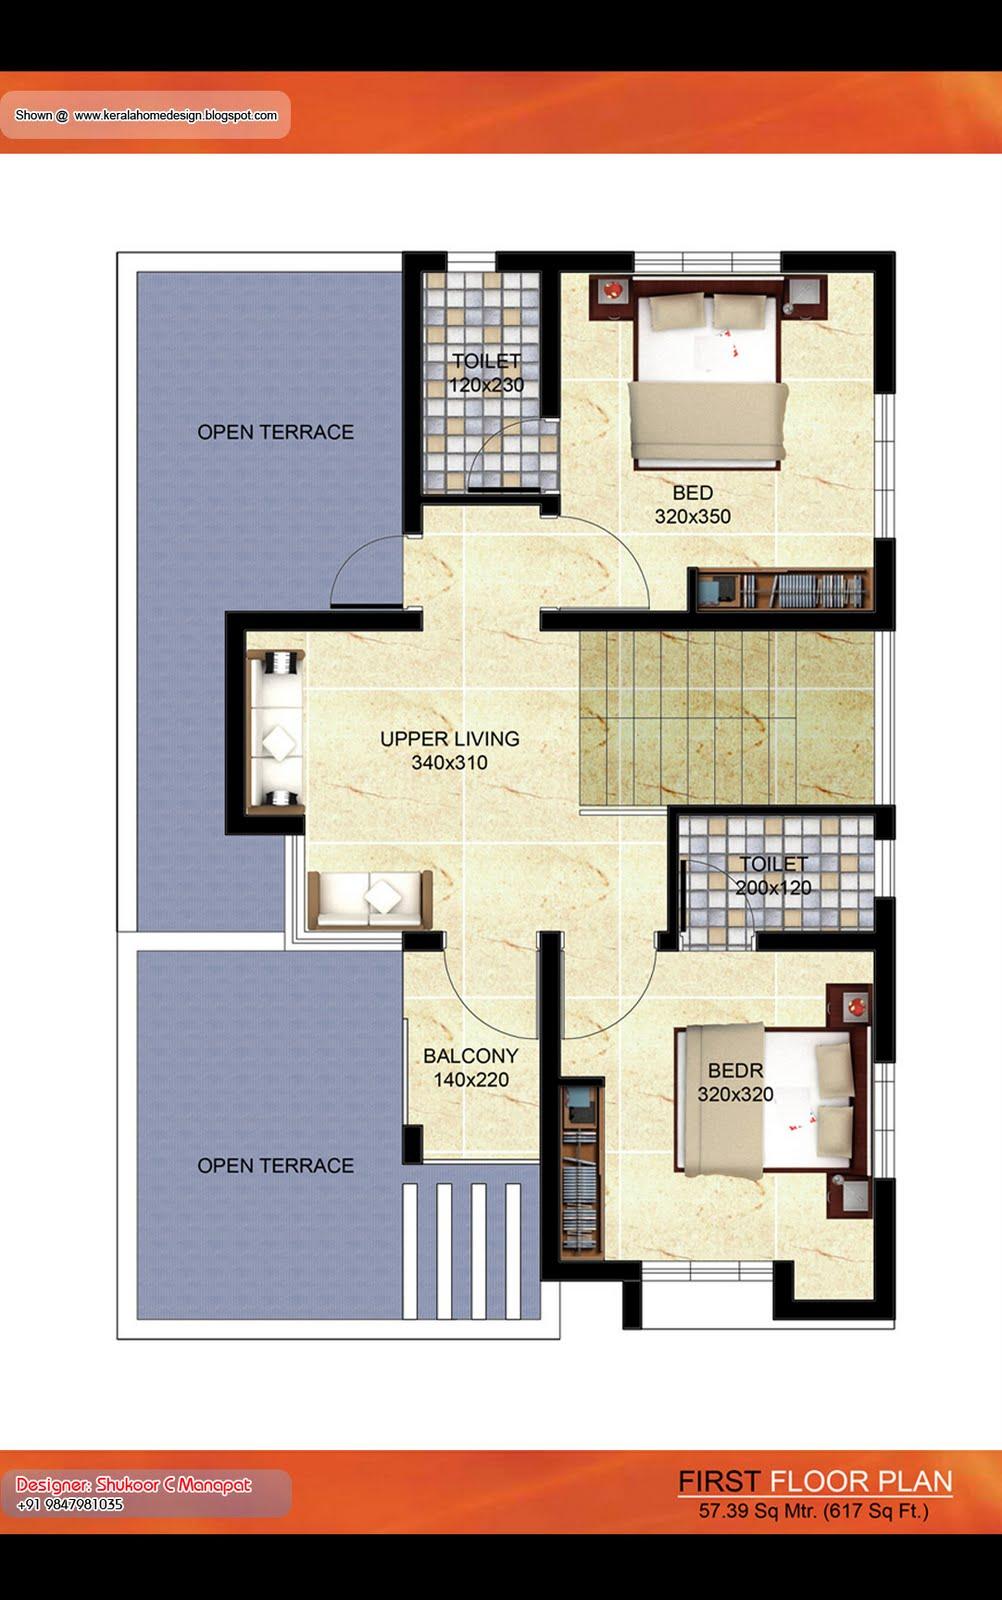 Kerala House Interior Design: Kerala Villa Plan - 1500 Sq. Ft